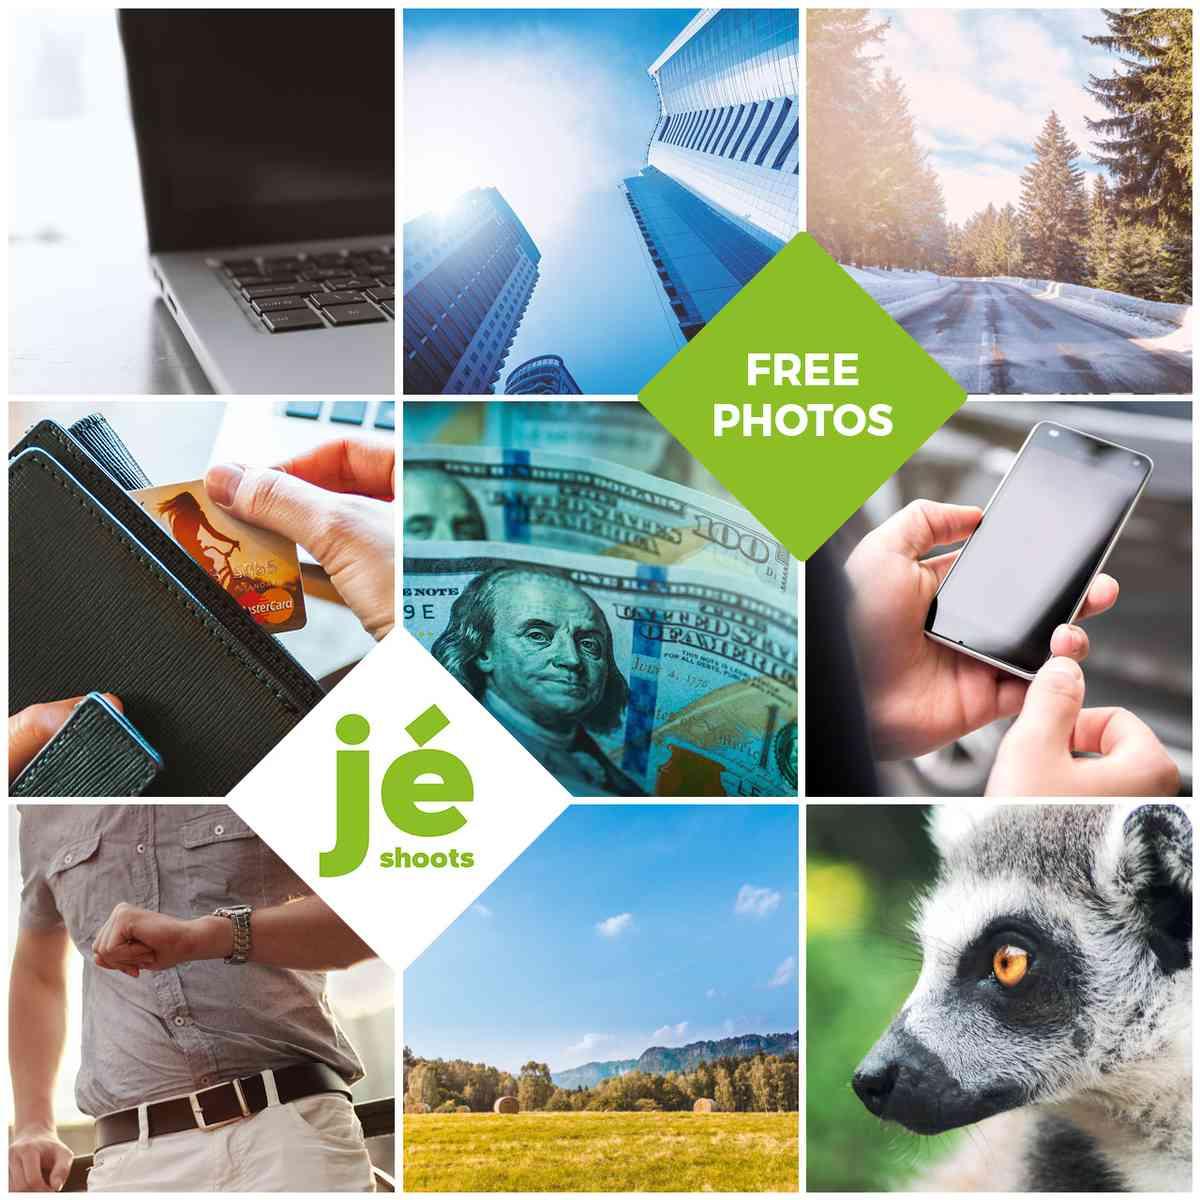 Free Stock Photos and PSD Mockups | JESHOOTS.com